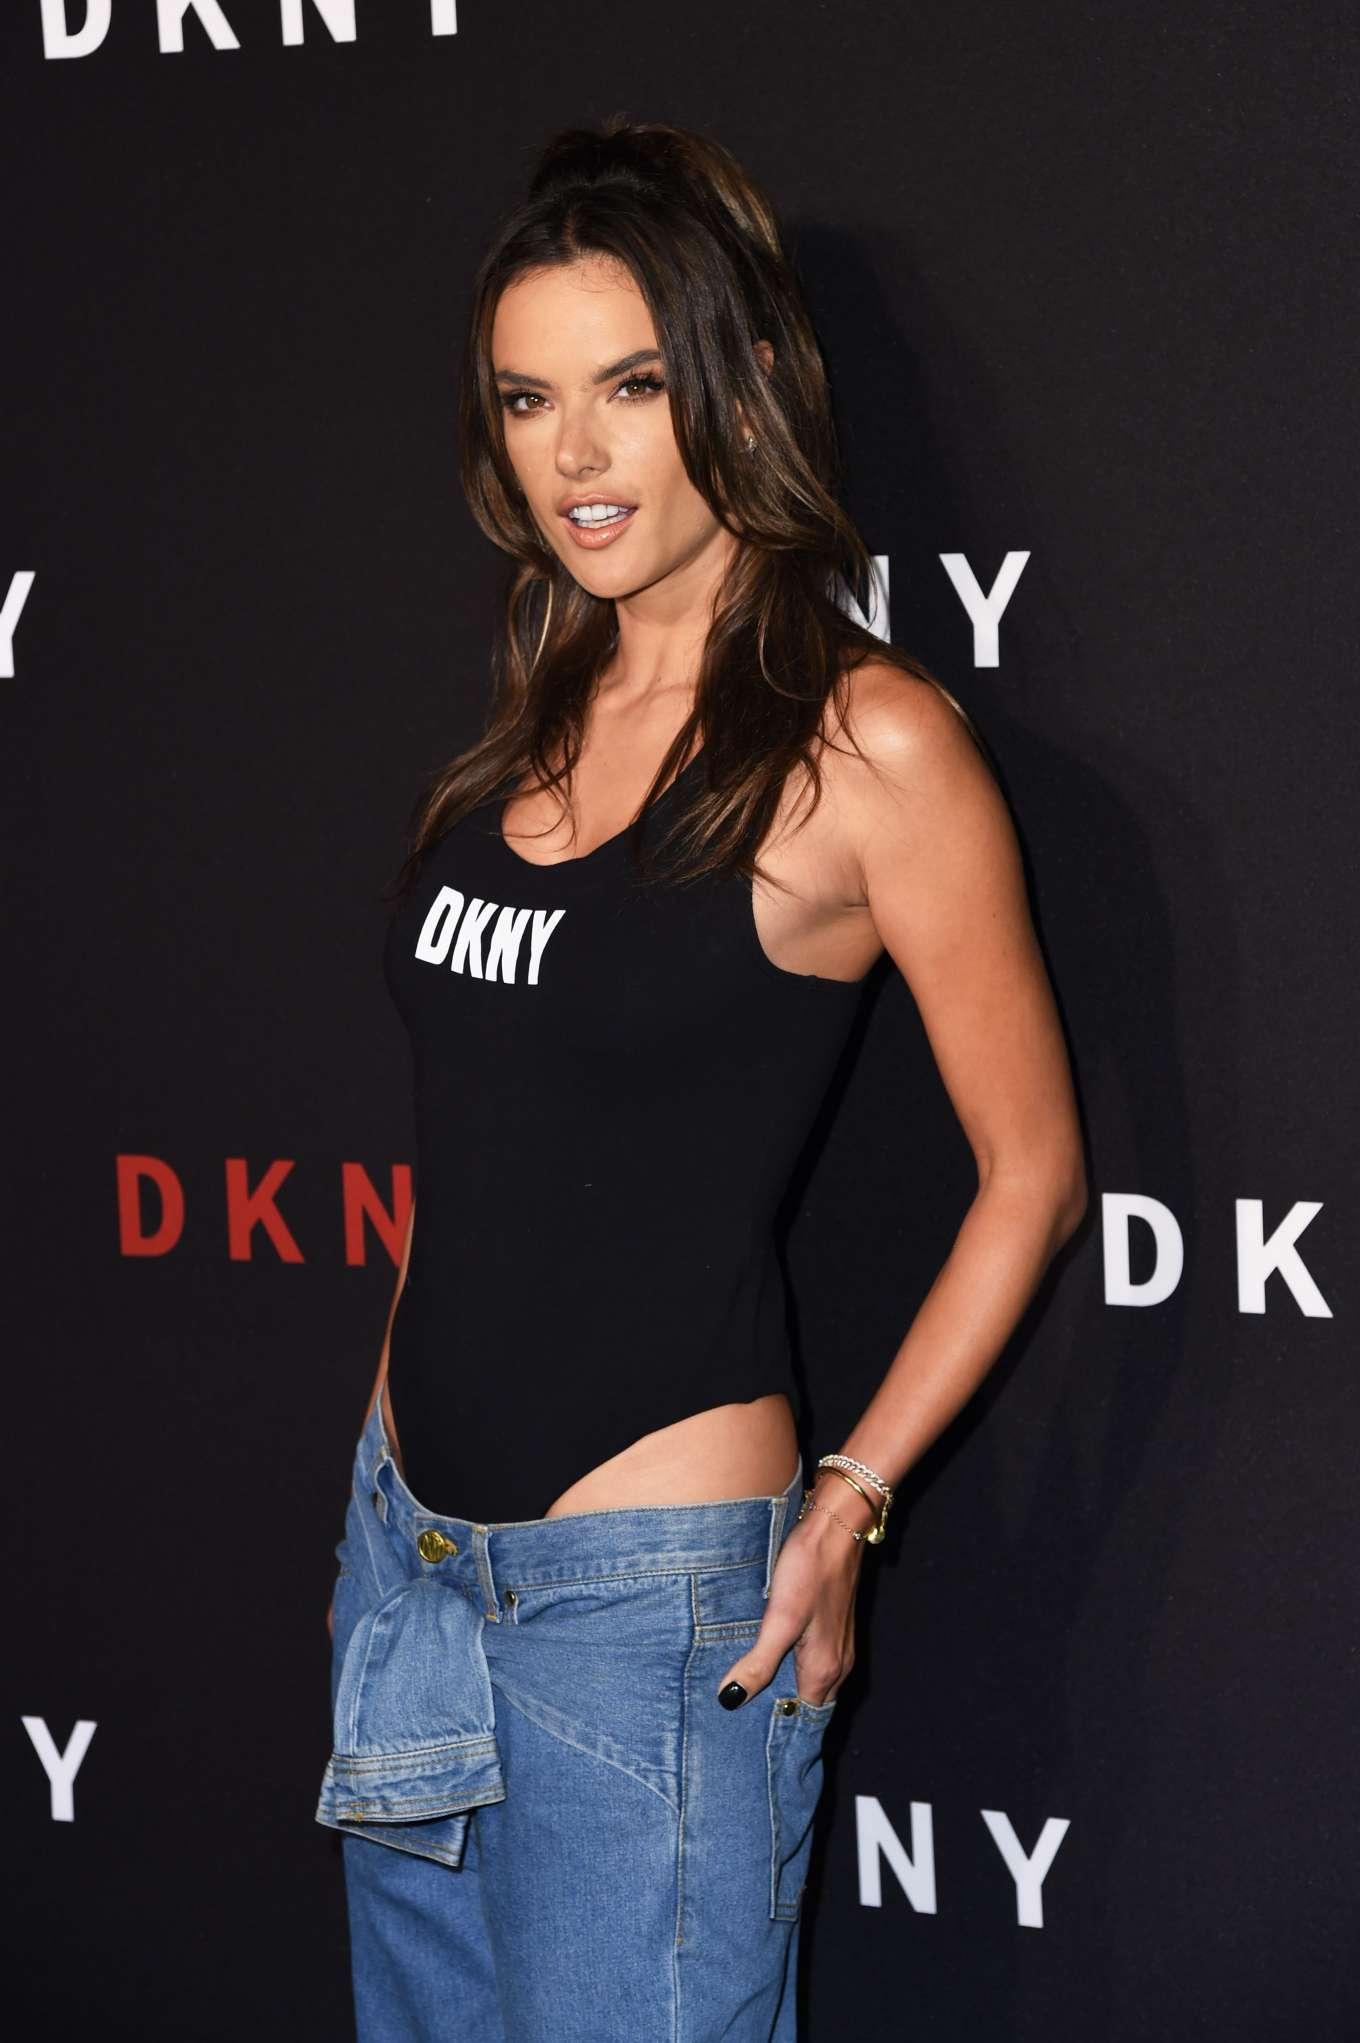 Alessandra Ambrosio - 30th anniversary of DKNY Party in NYC